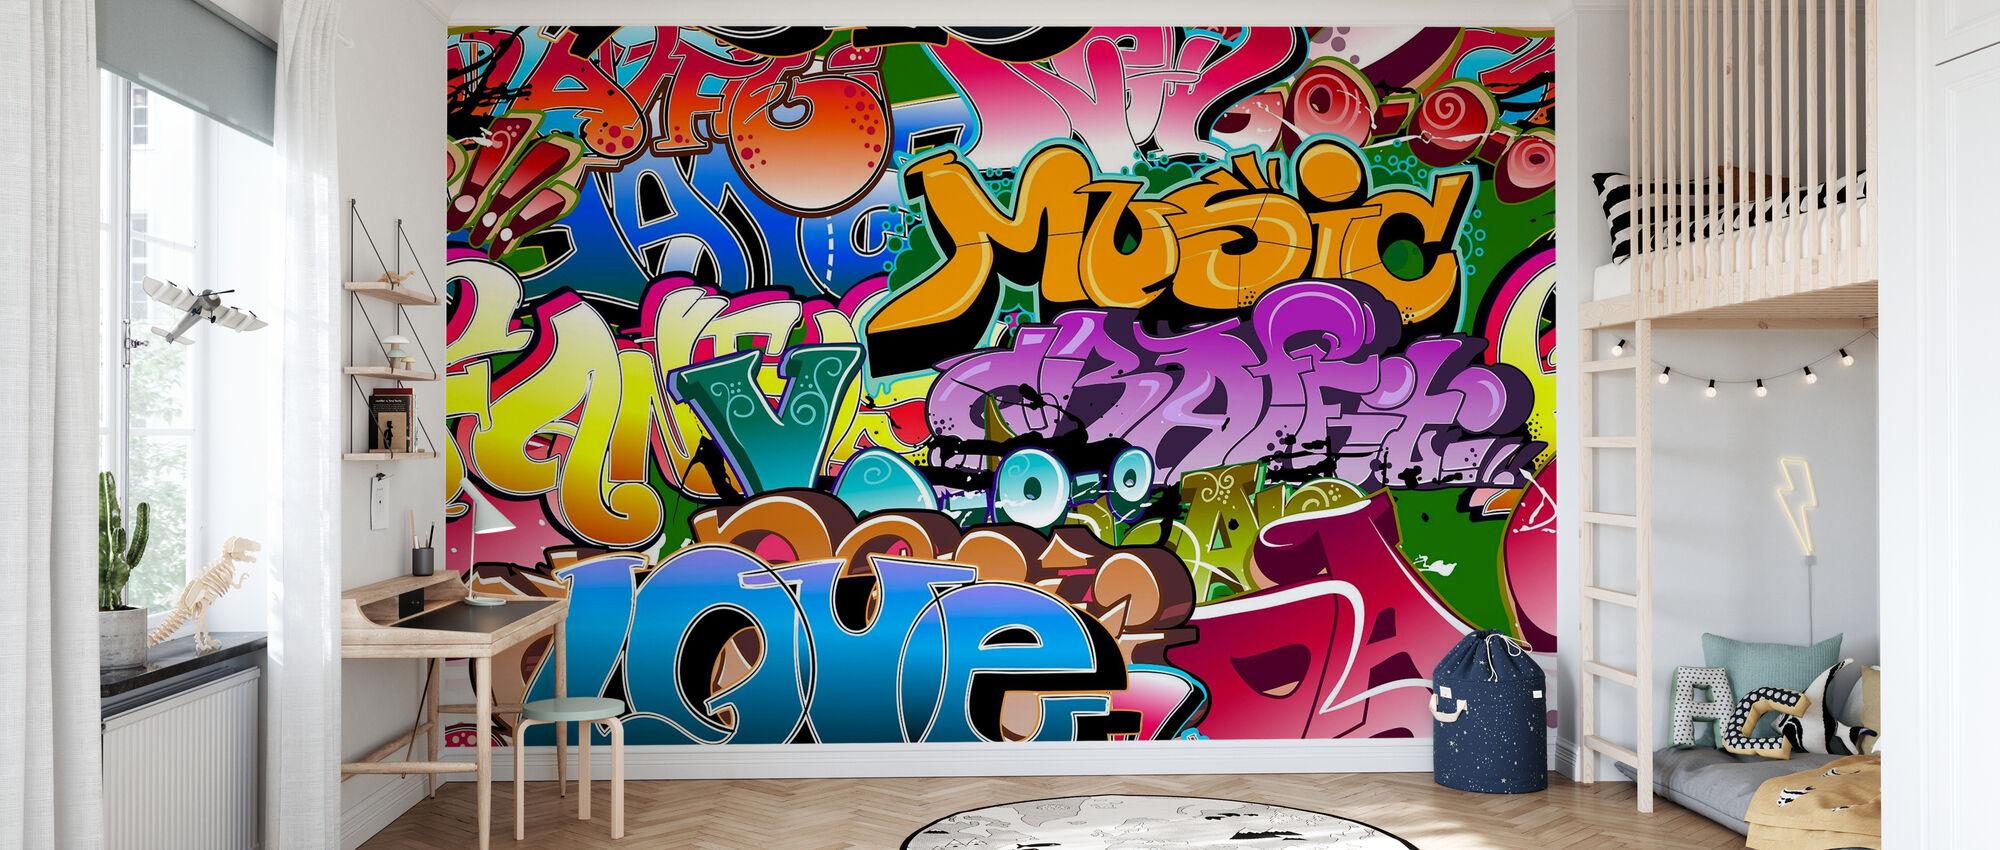 Music Love Graffiti - Wallpaper - Kids Room